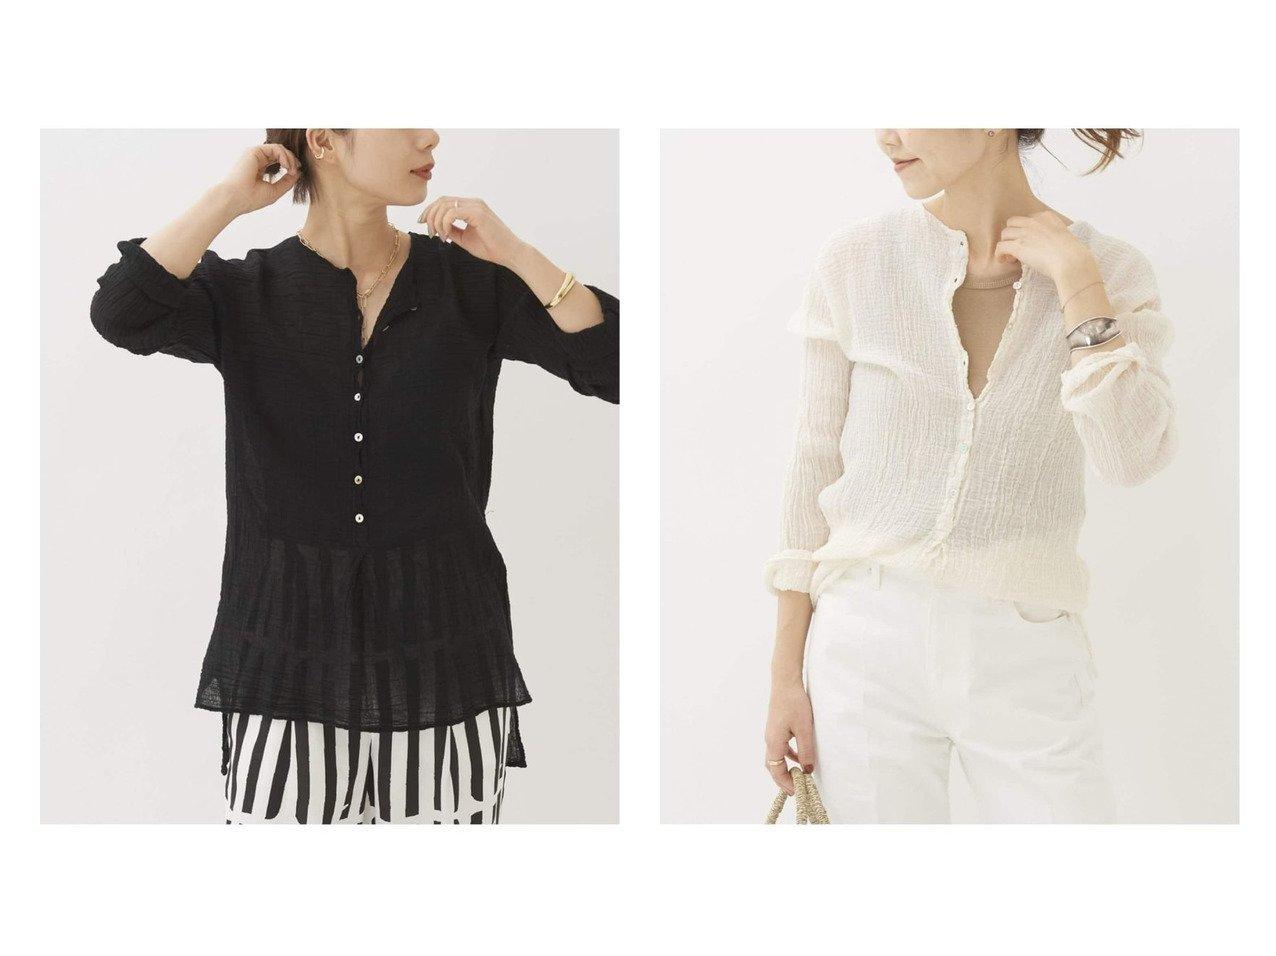 【Plage/プラージュ】の【LES ATELIERS FRANCAIS DE CONFECTION】SL シャツ3 【トップス・カットソー】おすすめ!人気、トレンド・レディースファッションの通販 おすすめで人気の流行・トレンド、ファッションの通販商品 インテリア・家具・メンズファッション・キッズファッション・レディースファッション・服の通販 founy(ファニー) https://founy.com/ ファッション Fashion レディースファッション WOMEN トップス・カットソー Tops/Tshirt シャツ/ブラウス Shirts/Blouses NEW・新作・新着・新入荷 New Arrivals 2021年 2021 2021春夏・S/S SS/Spring/Summer/2021 S/S・春夏 SS・Spring/Summer  ID:crp329100000049540